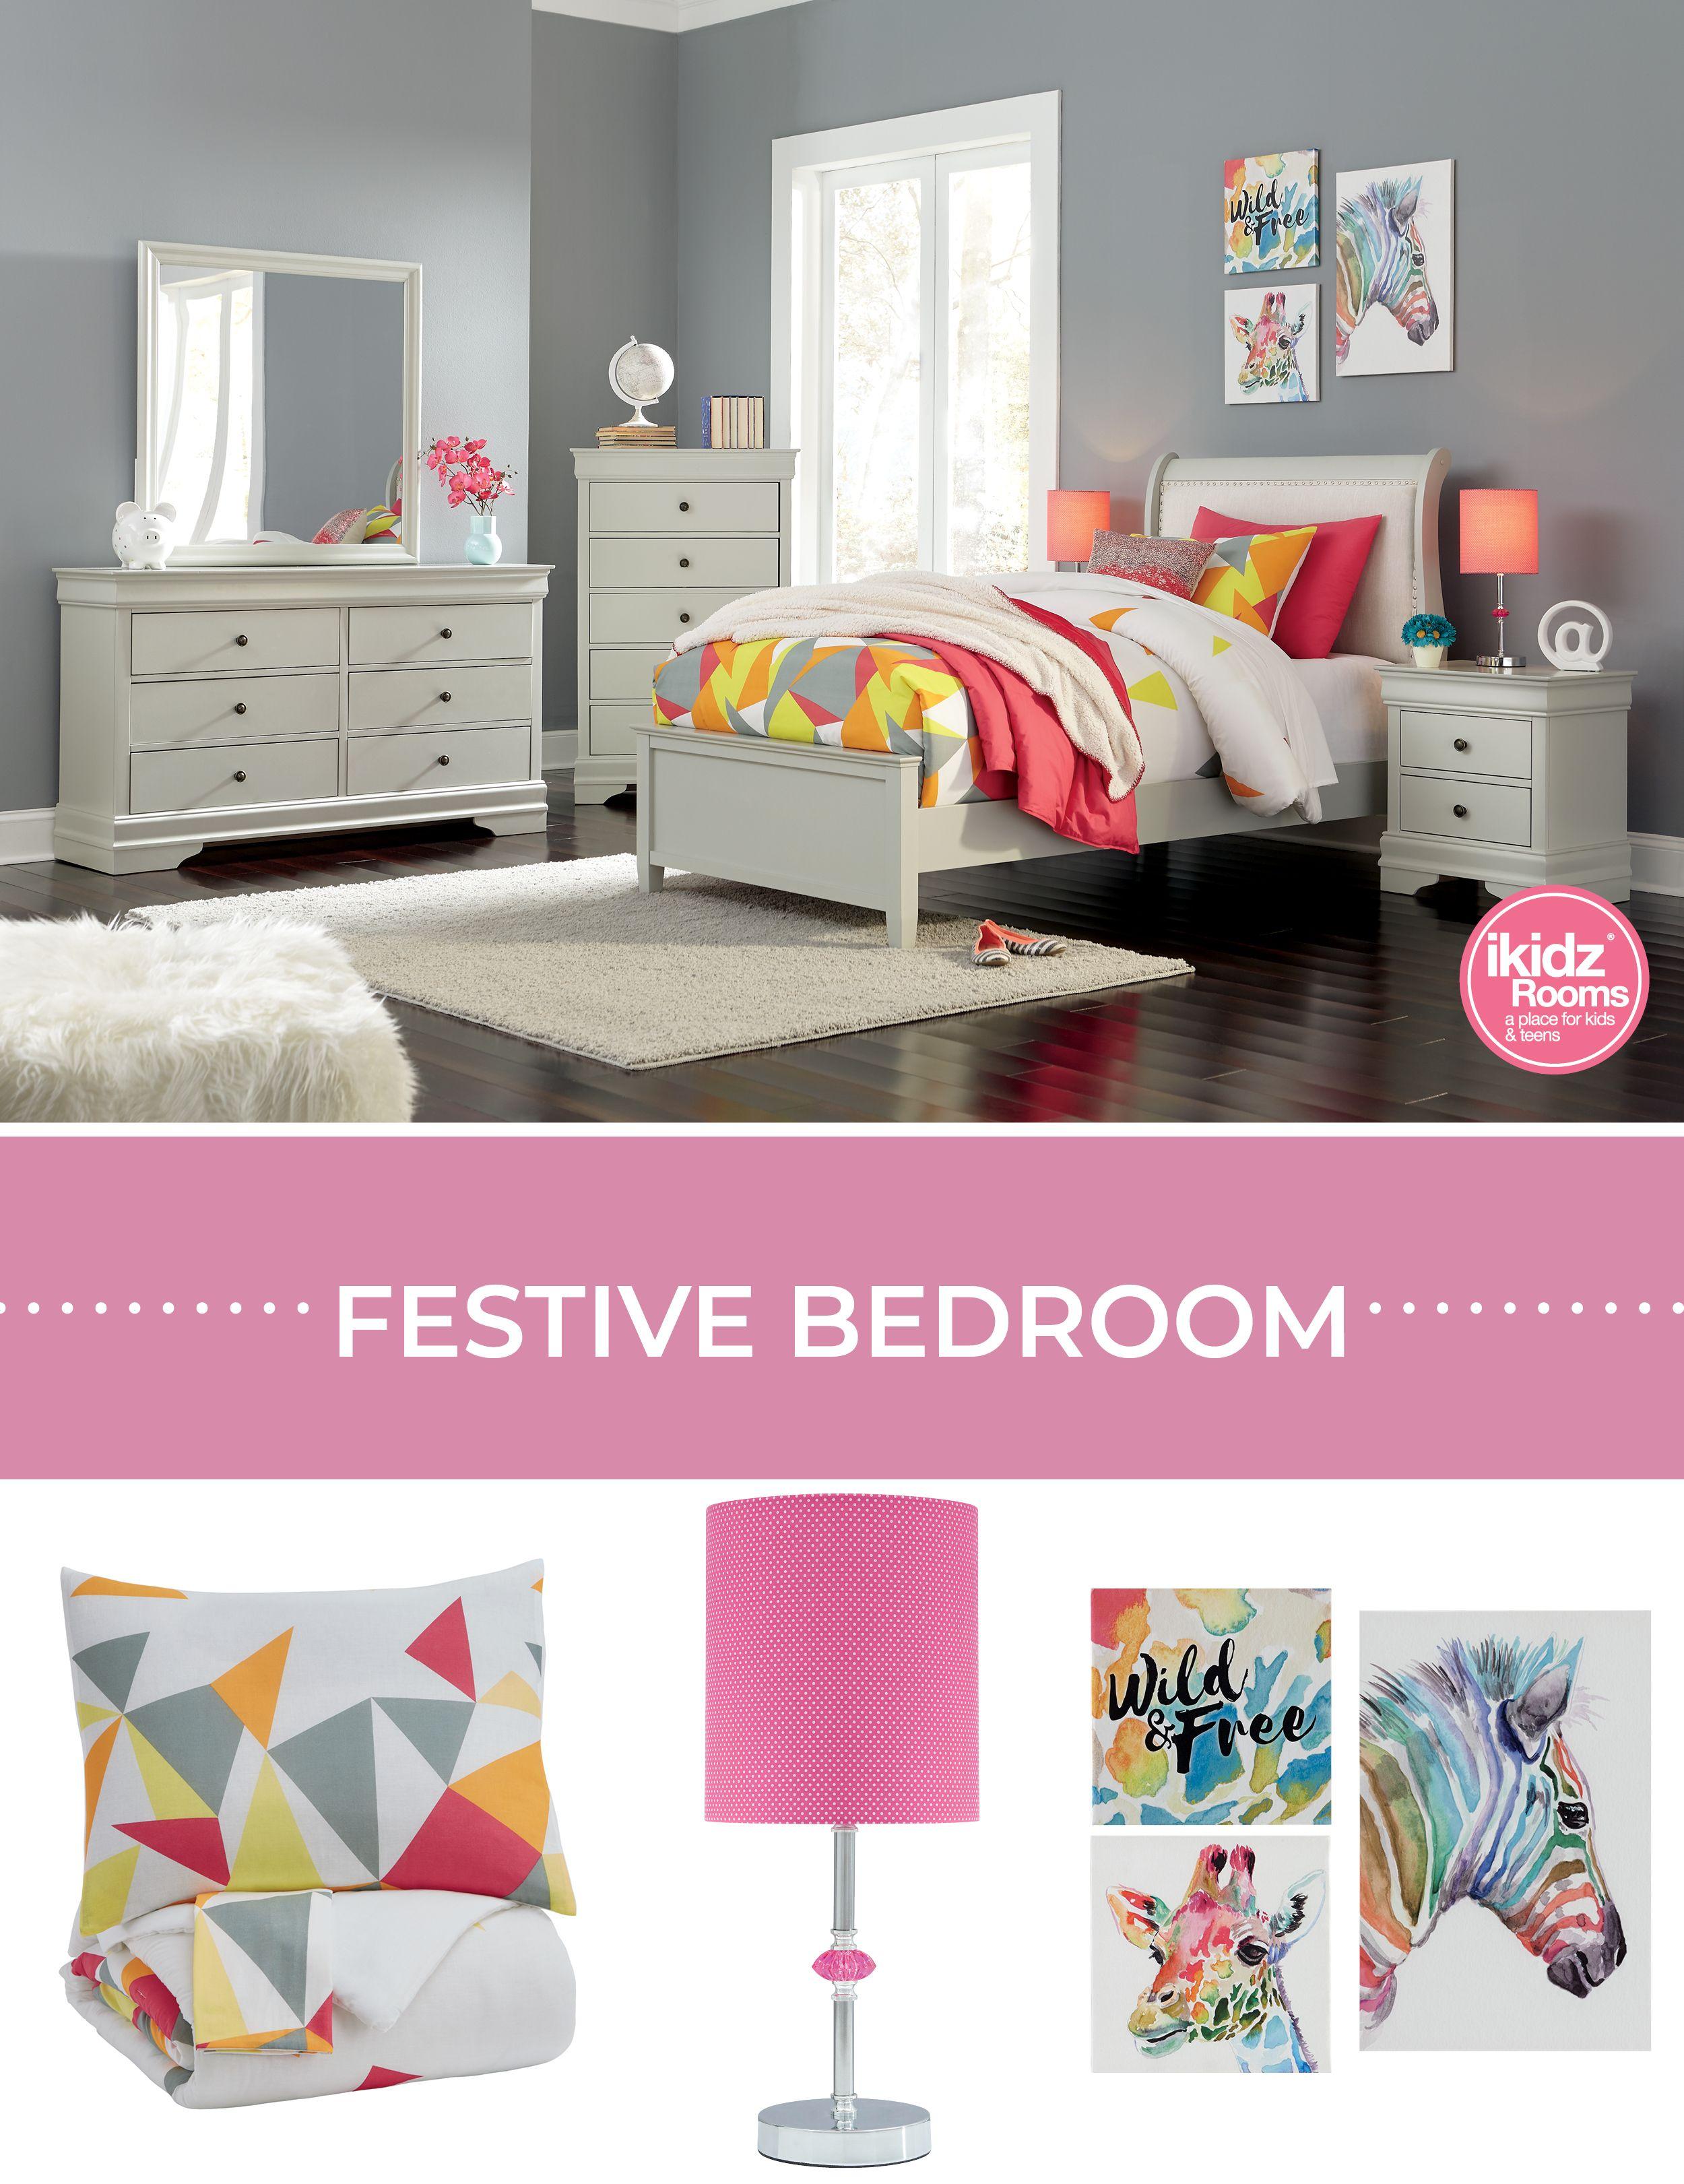 Maxie Multi Color Comforter Set By Ashley Furniture Ashleyfurniture Bedroomdecor Bedroomgoals Bedroom Bedroom Decor Ashley Furniture Colorful Comforter